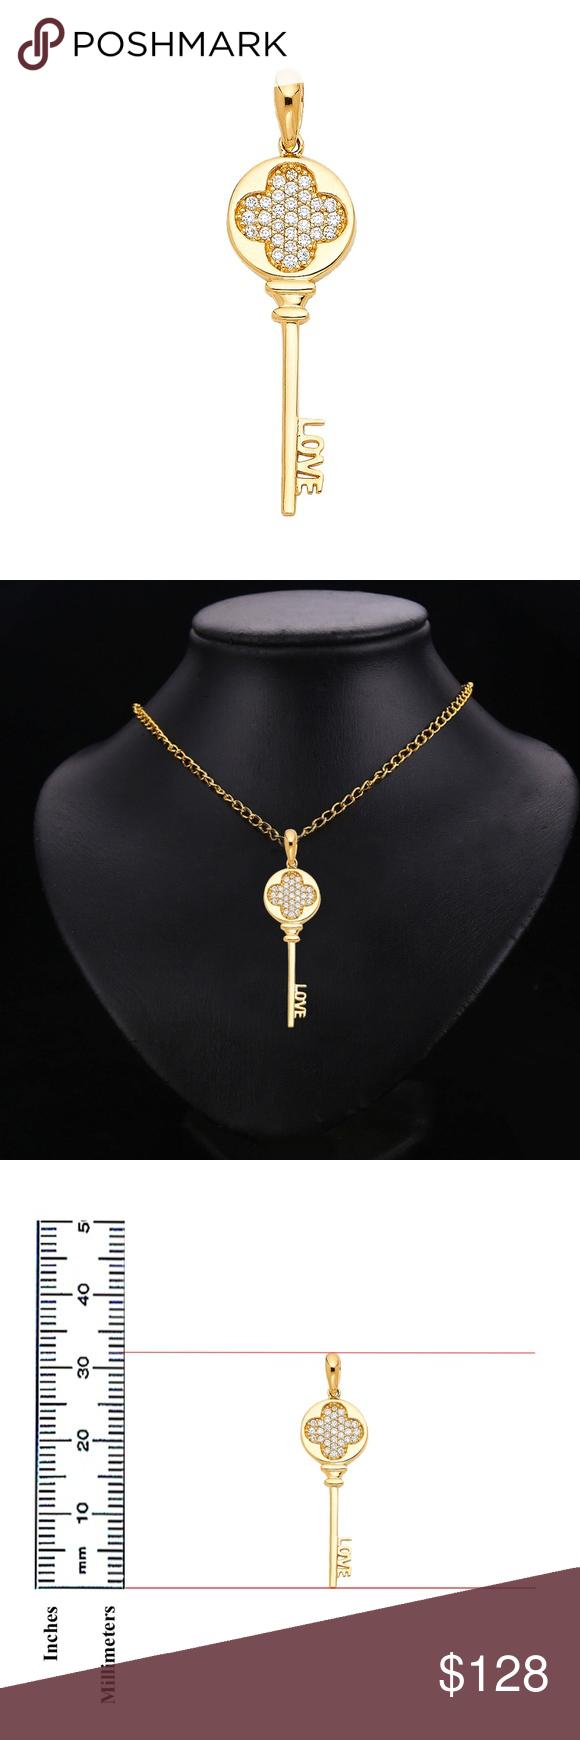 14k Yellow Gold Love Key Pendant Height 32 MM Width 11 MM